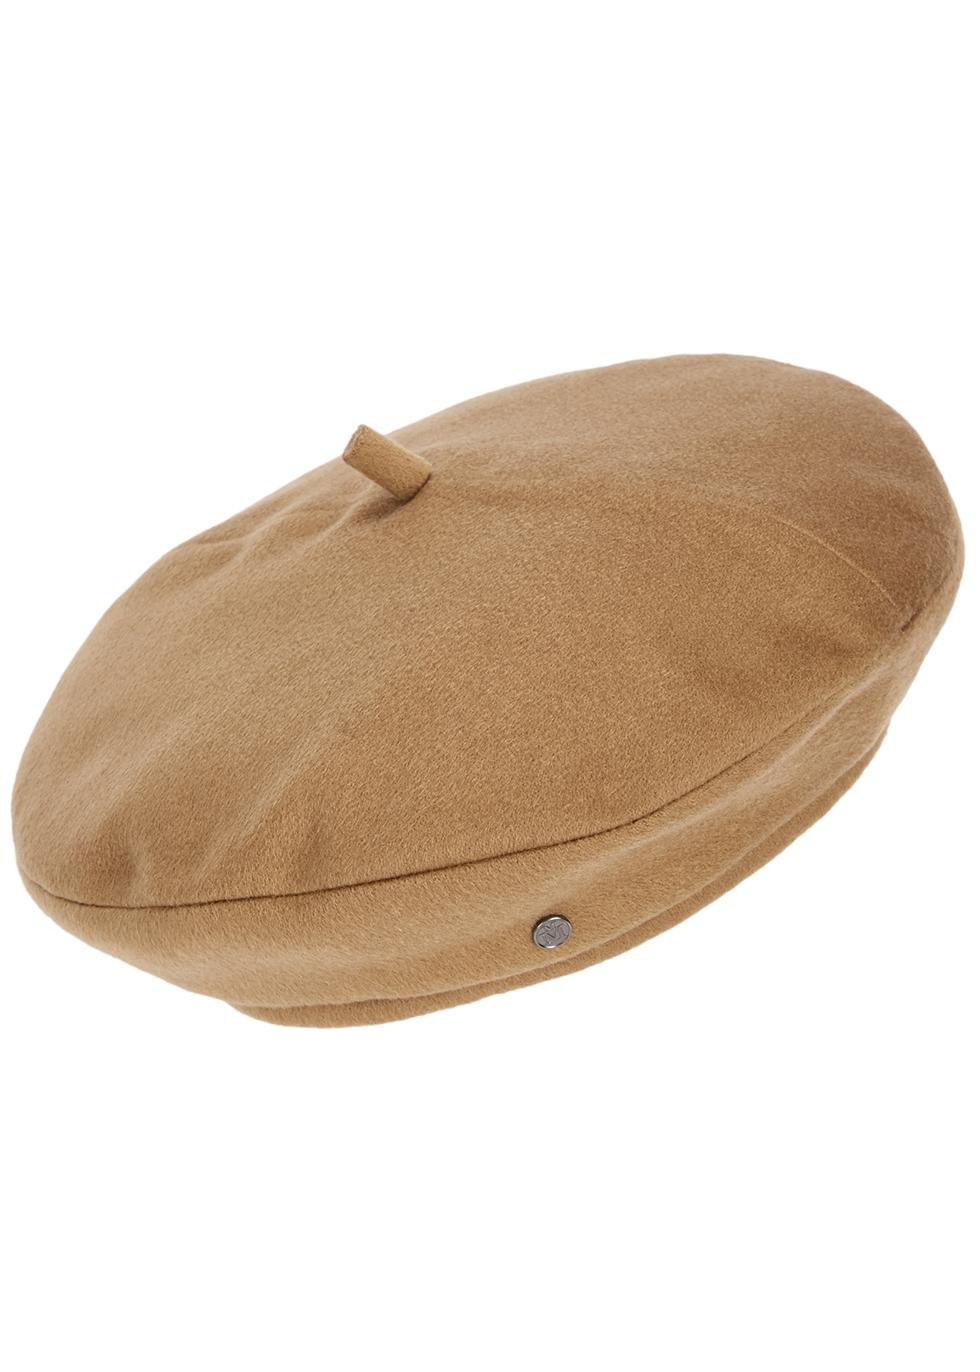 New Billy camel cashmere beret